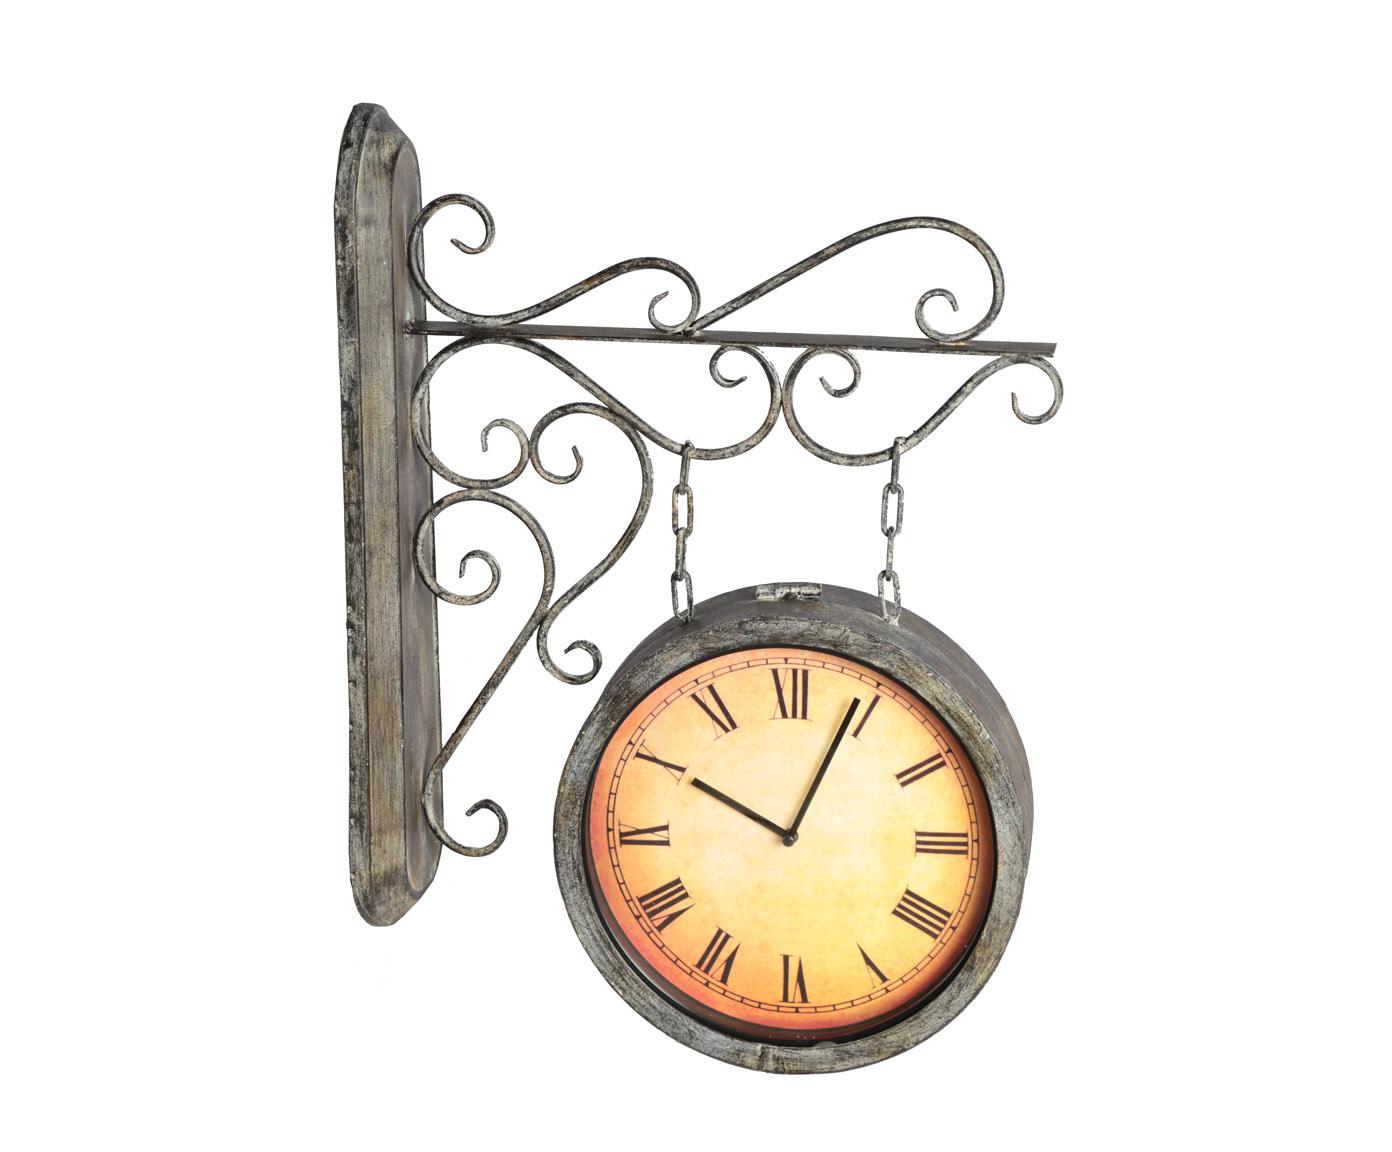 Часы настенныеНастенные часы<br>Кварцевый механизм, работают от батарейки типа АА.<br><br>Material: Металл<br>Width см: 40<br>Depth см: 11<br>Height см: 52,5